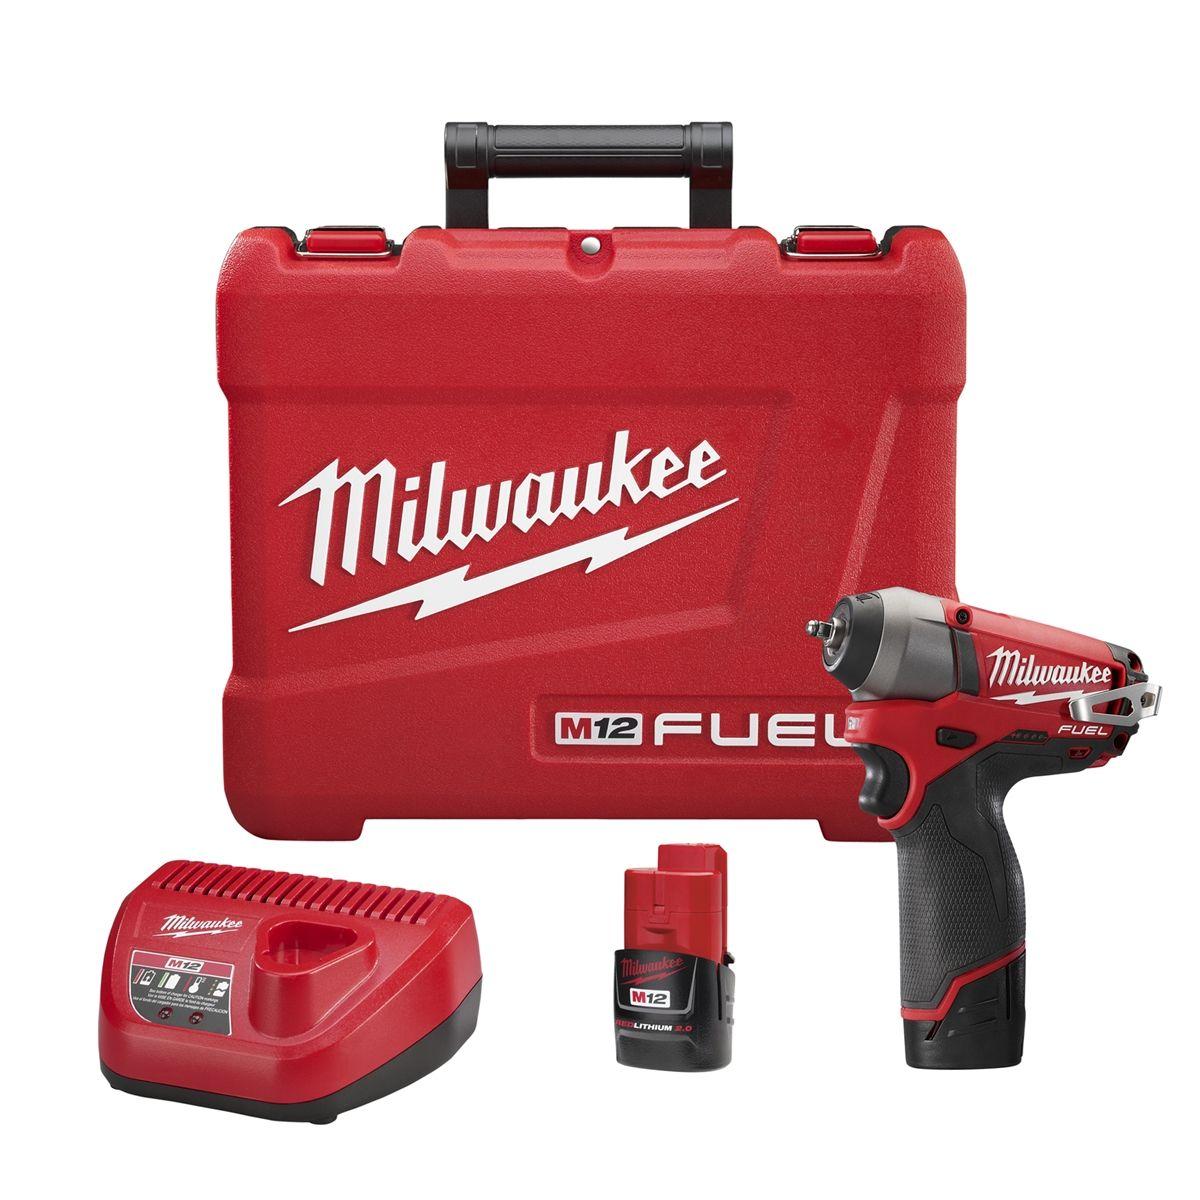 Milwaukee 2452-20 M12 Fuel 1//4 Impact Wrench Bare Tool